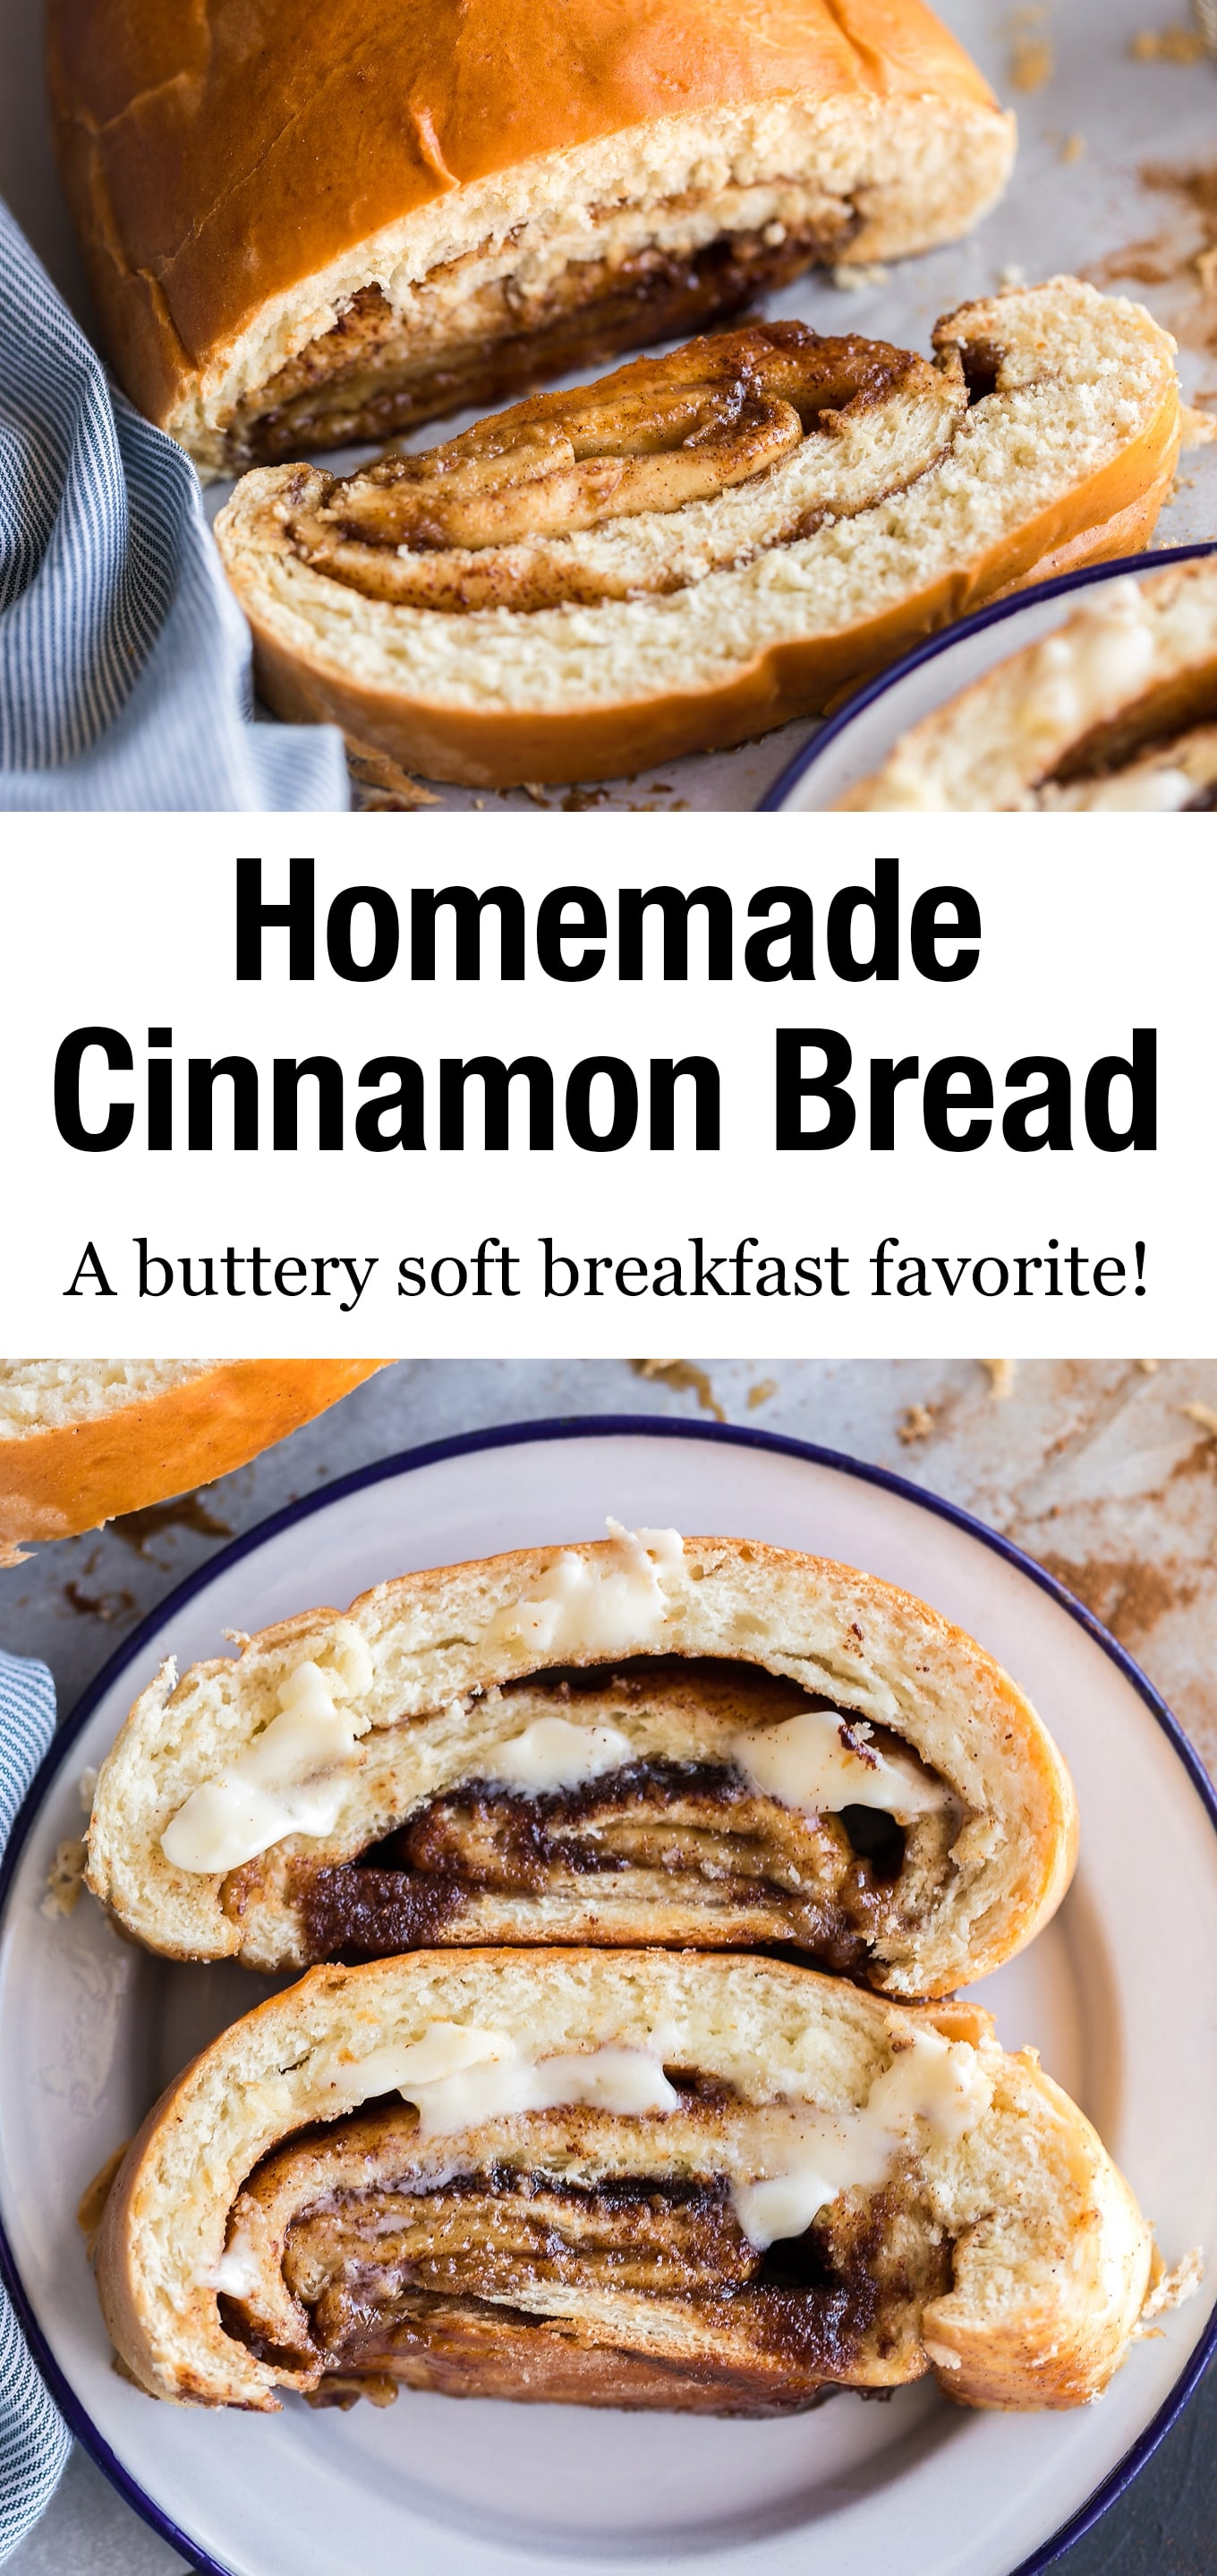 Bursting with gooey brown sugar and rich cinnamon flavor, this buttery soft cinnamon swirl bread is a breakfast favorite! #cinnamonswirlbread #cinnamonbread #breakfast via @firefliesandmudpies